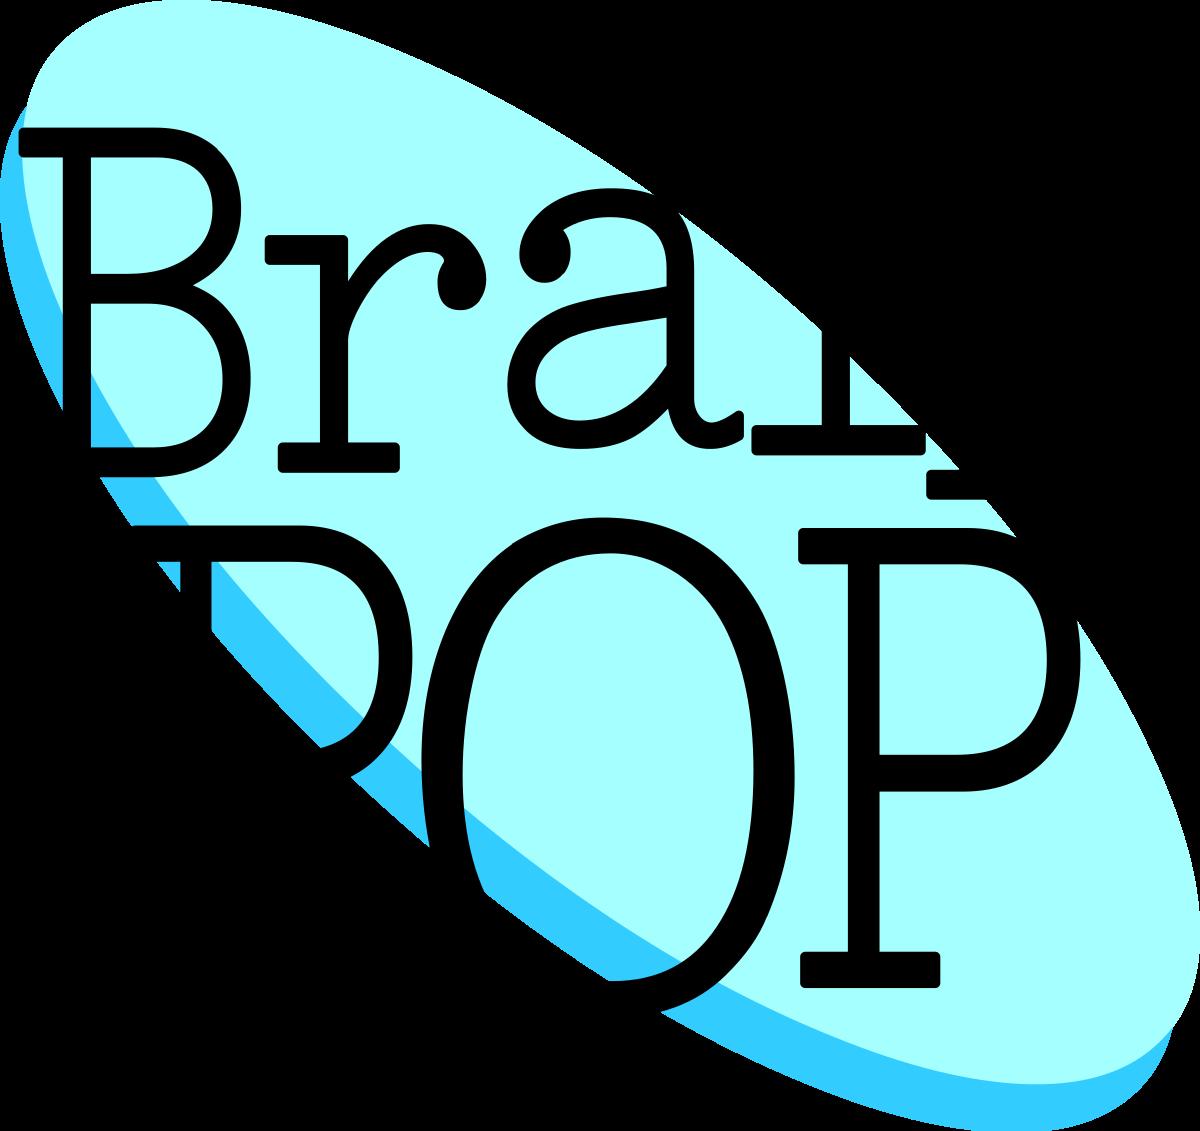 brain pop grades 3-12